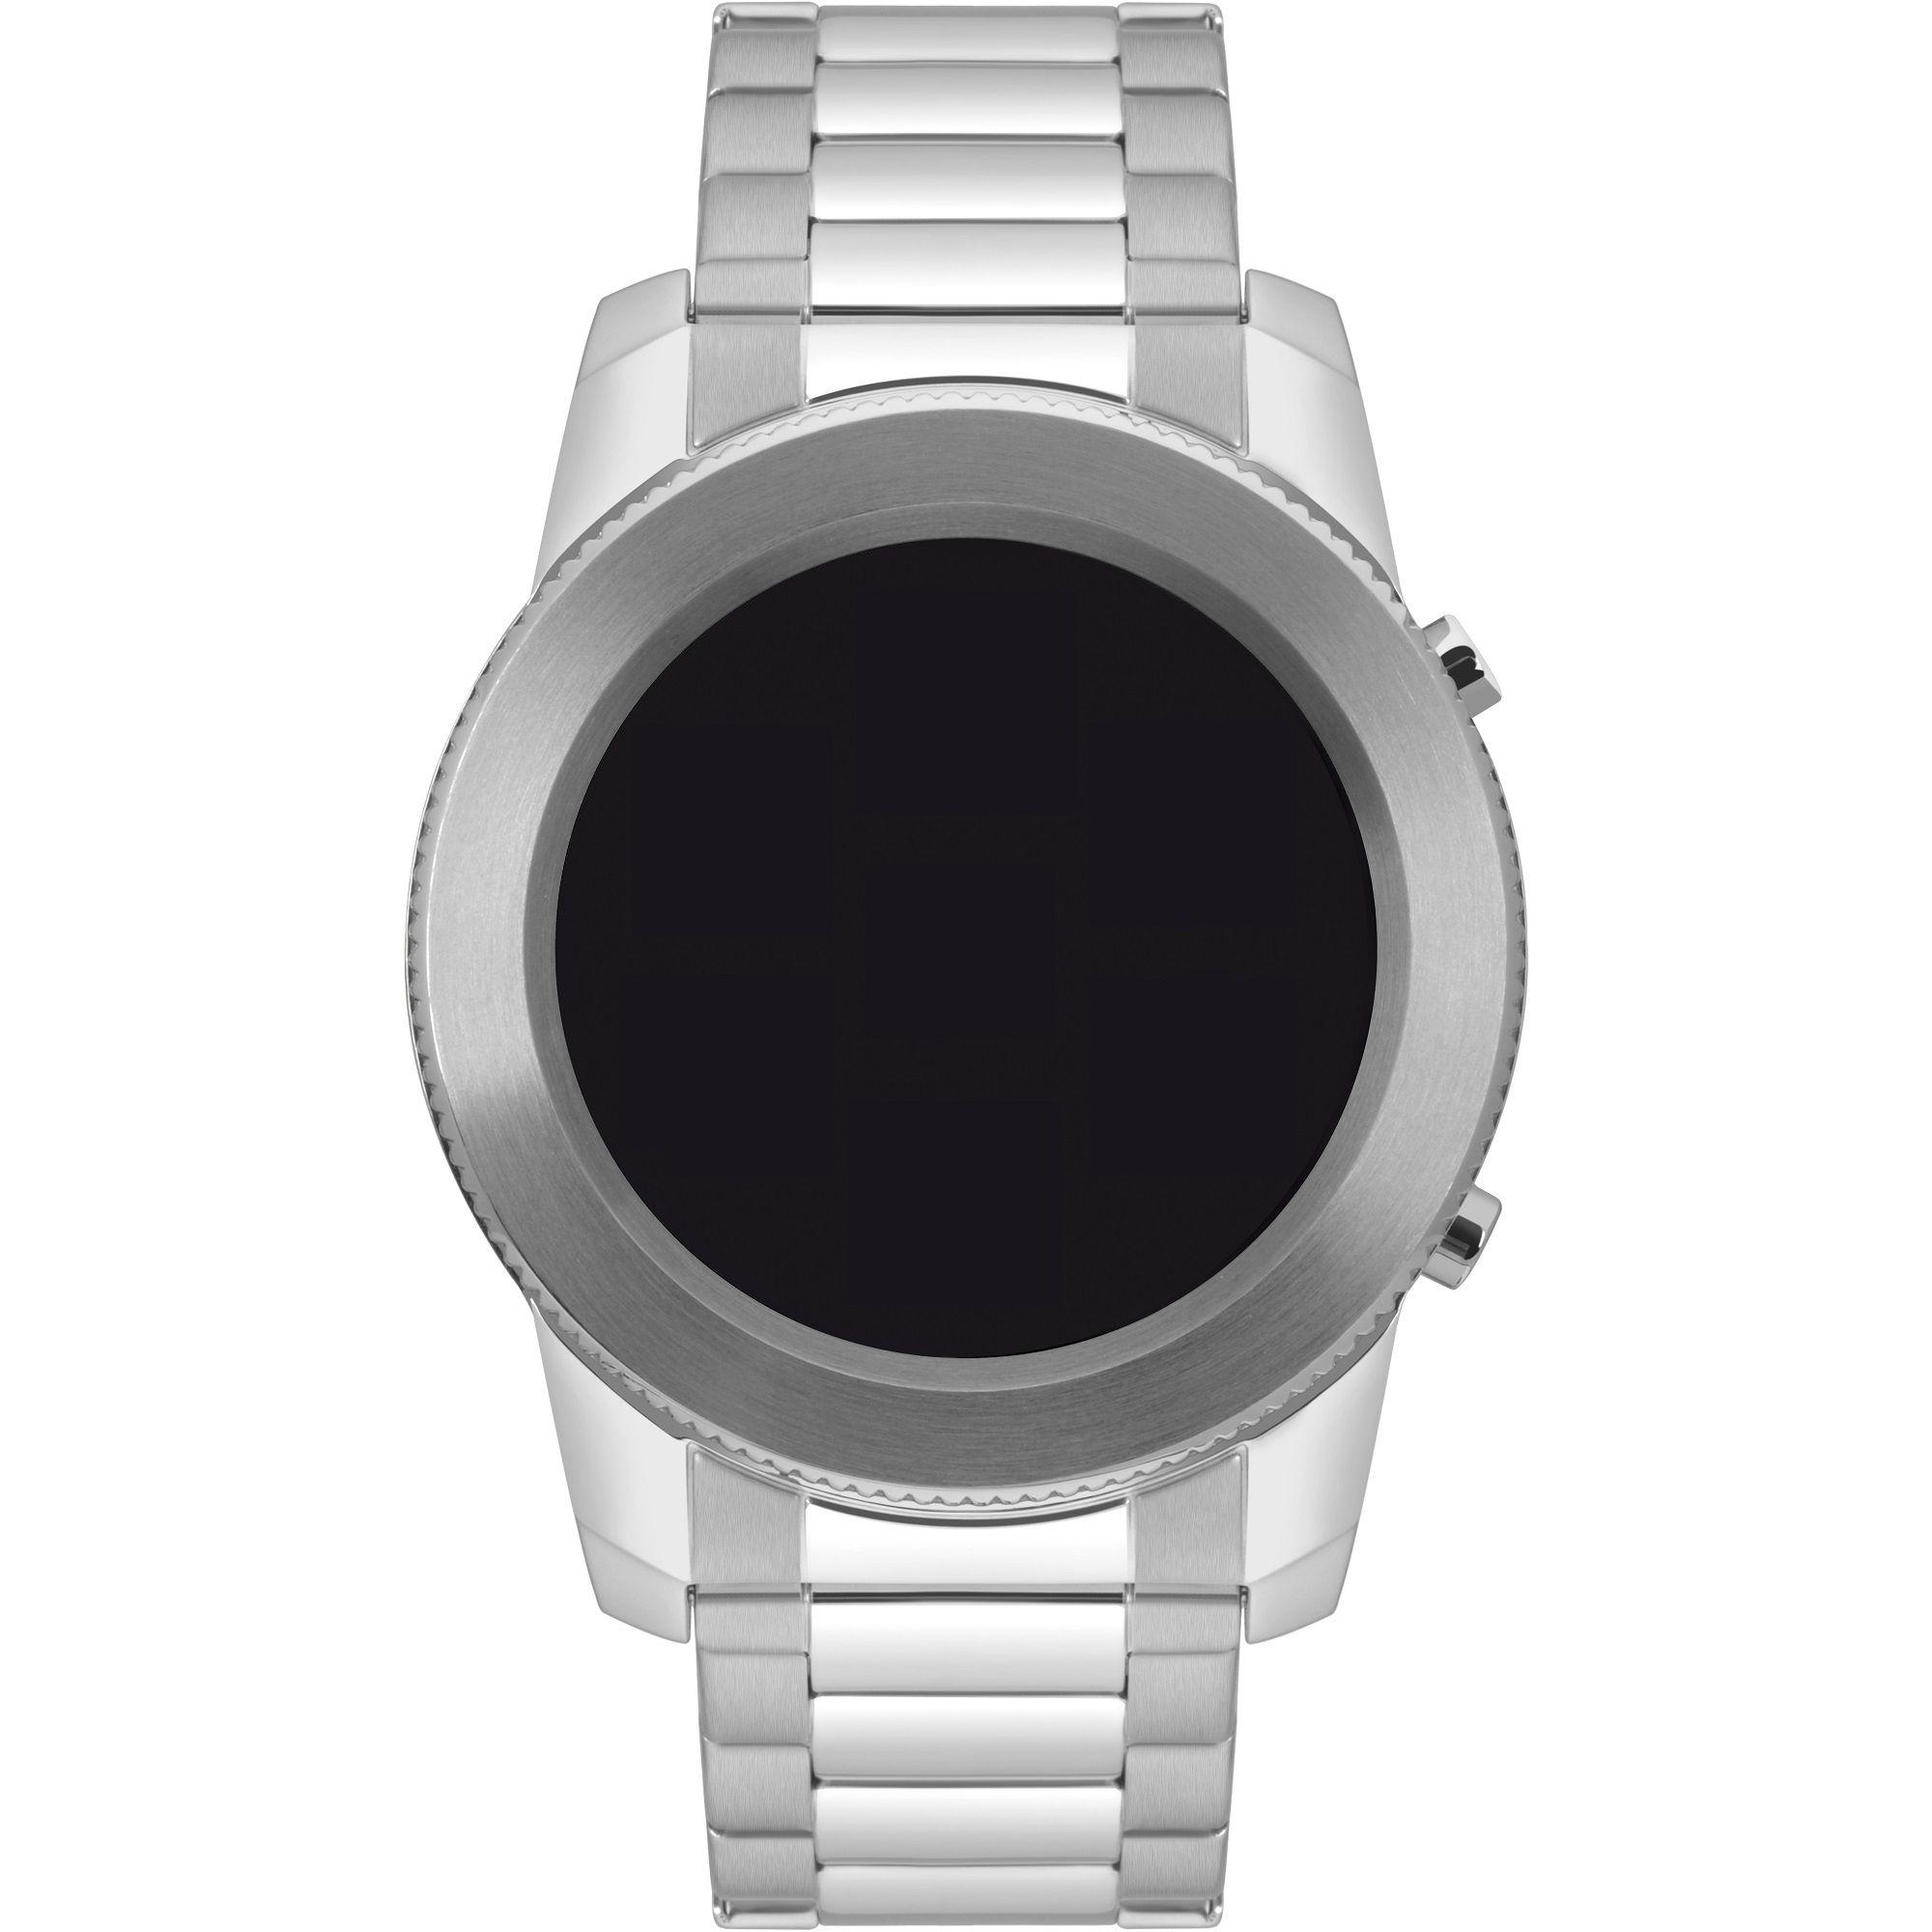 64461f2164b9b ... Relógio Masculino Technos Connect Smartwatch M1AA 1P Aço Prata -  Vitrino Relógios